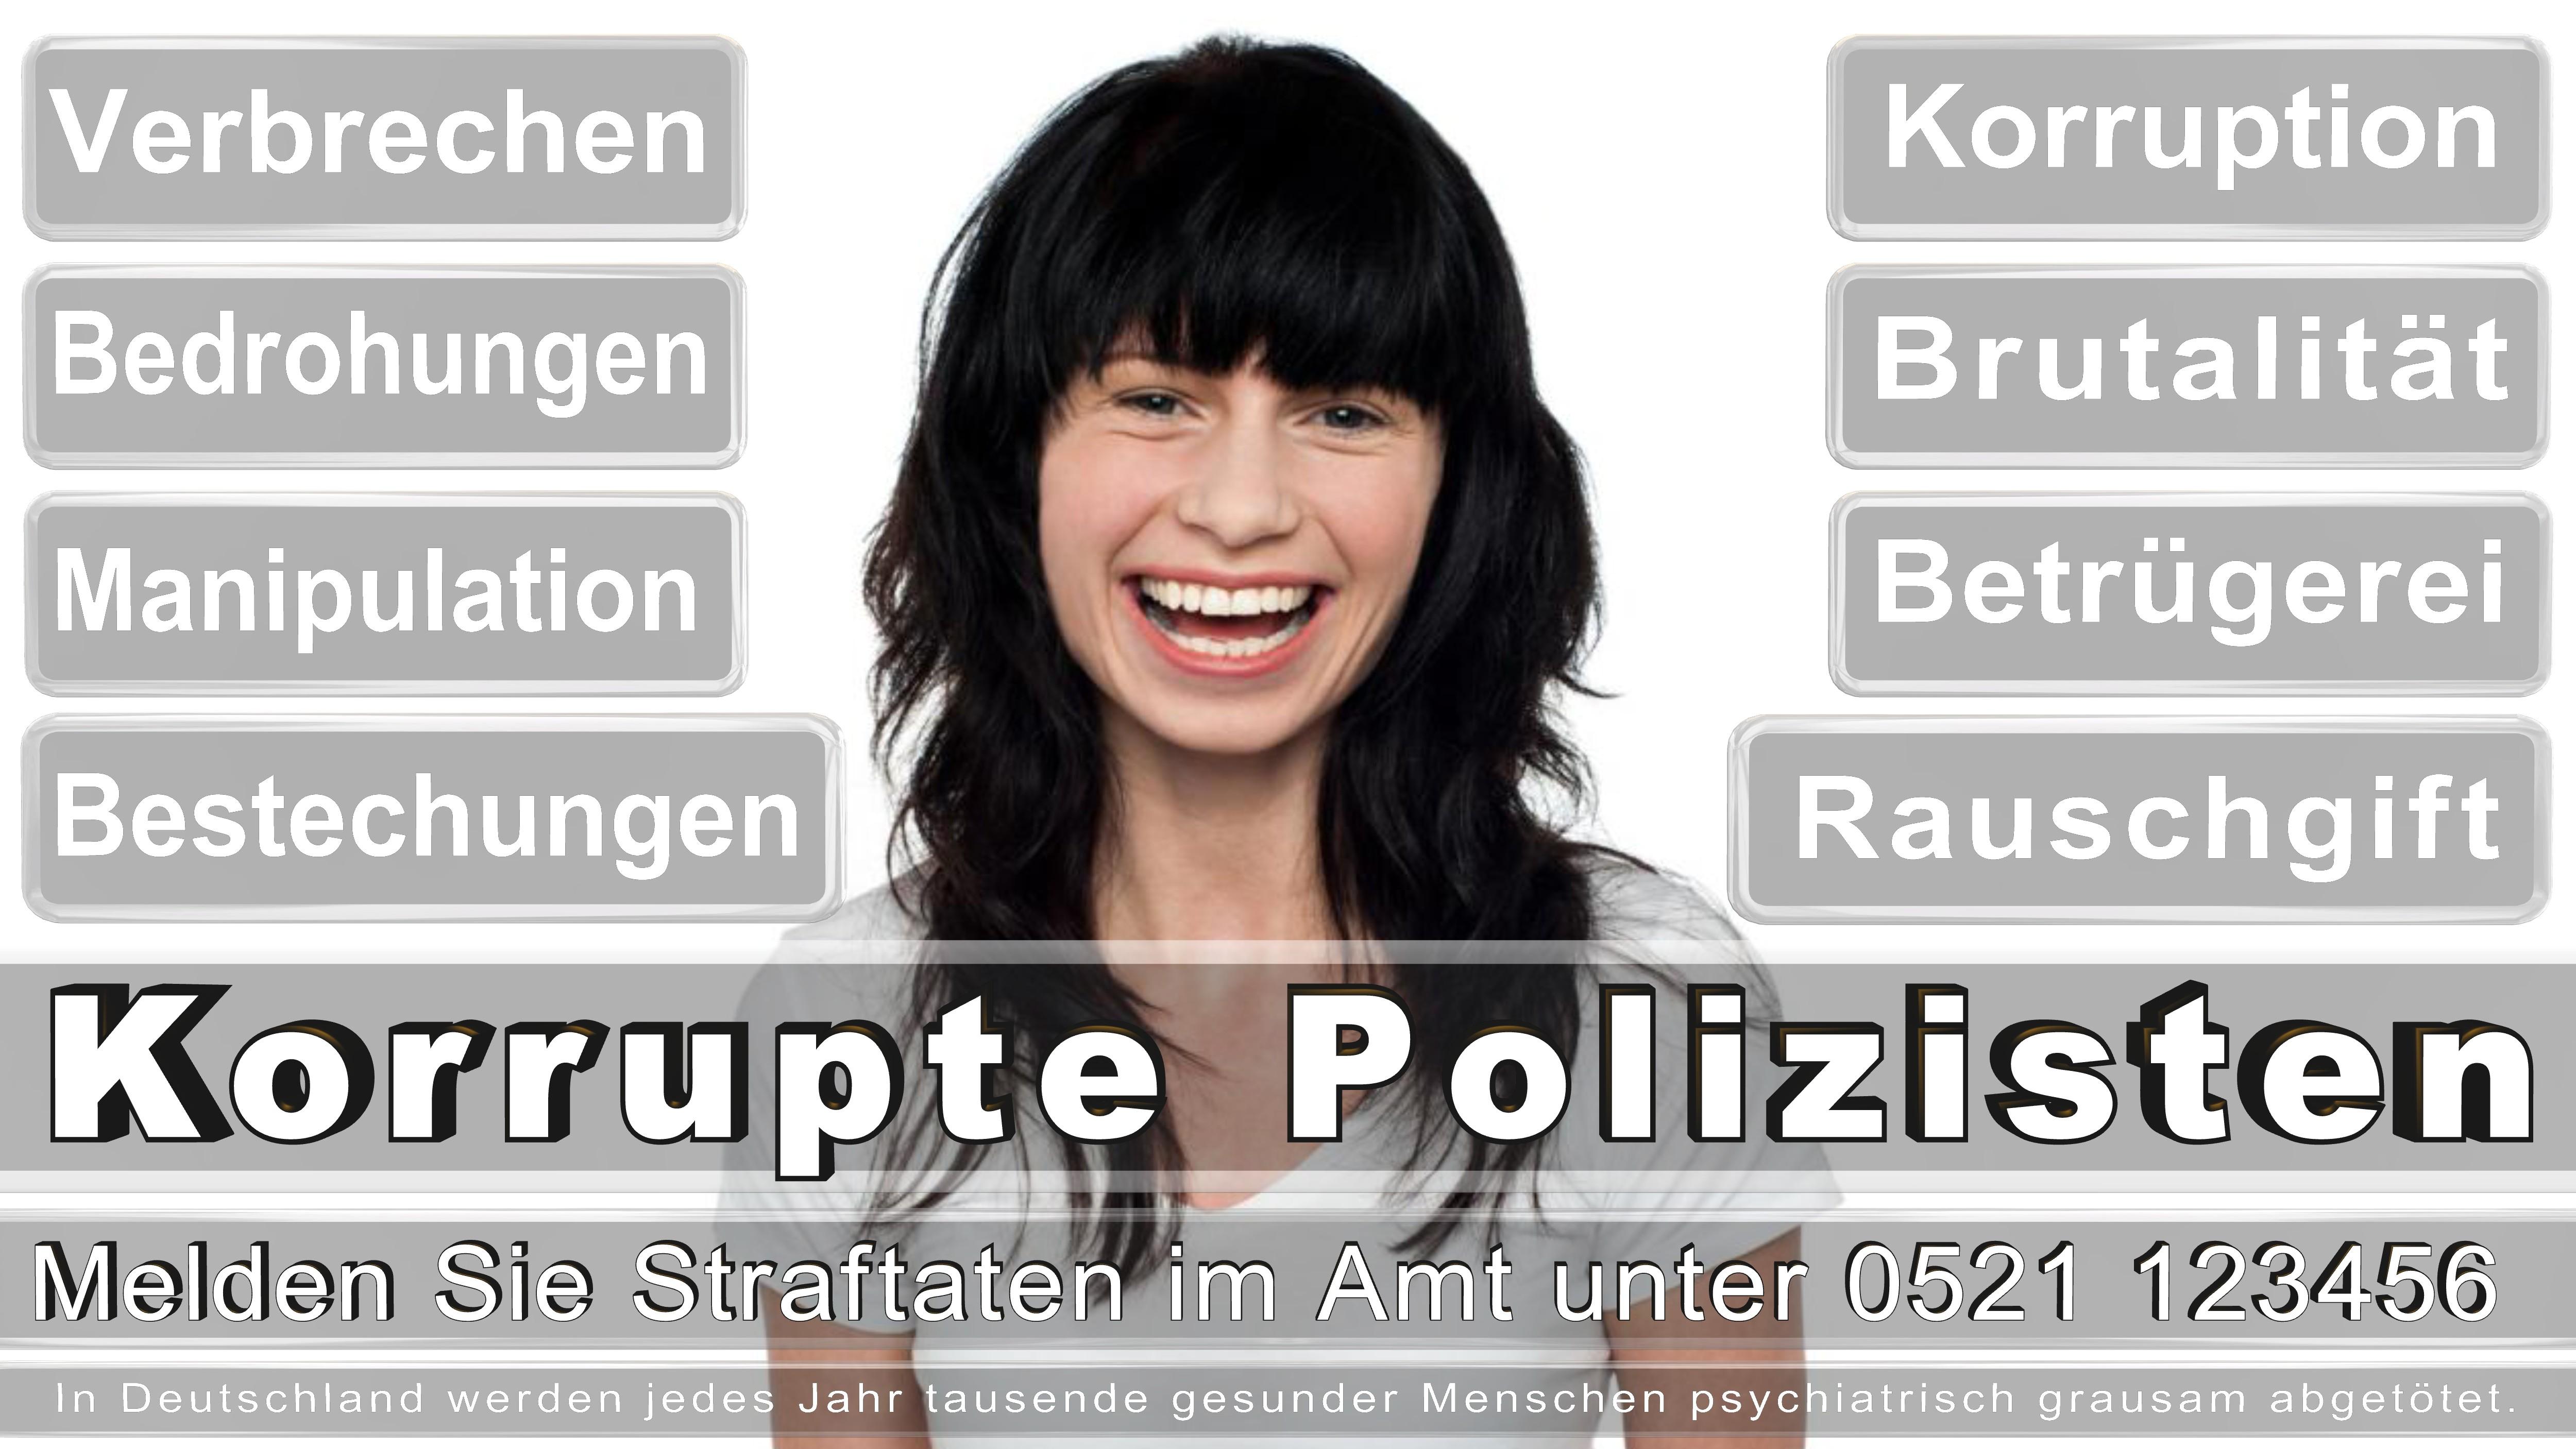 Polizei-Bielefeld-Polizei-Bielefeld-Polizei-Bielefeld (154)